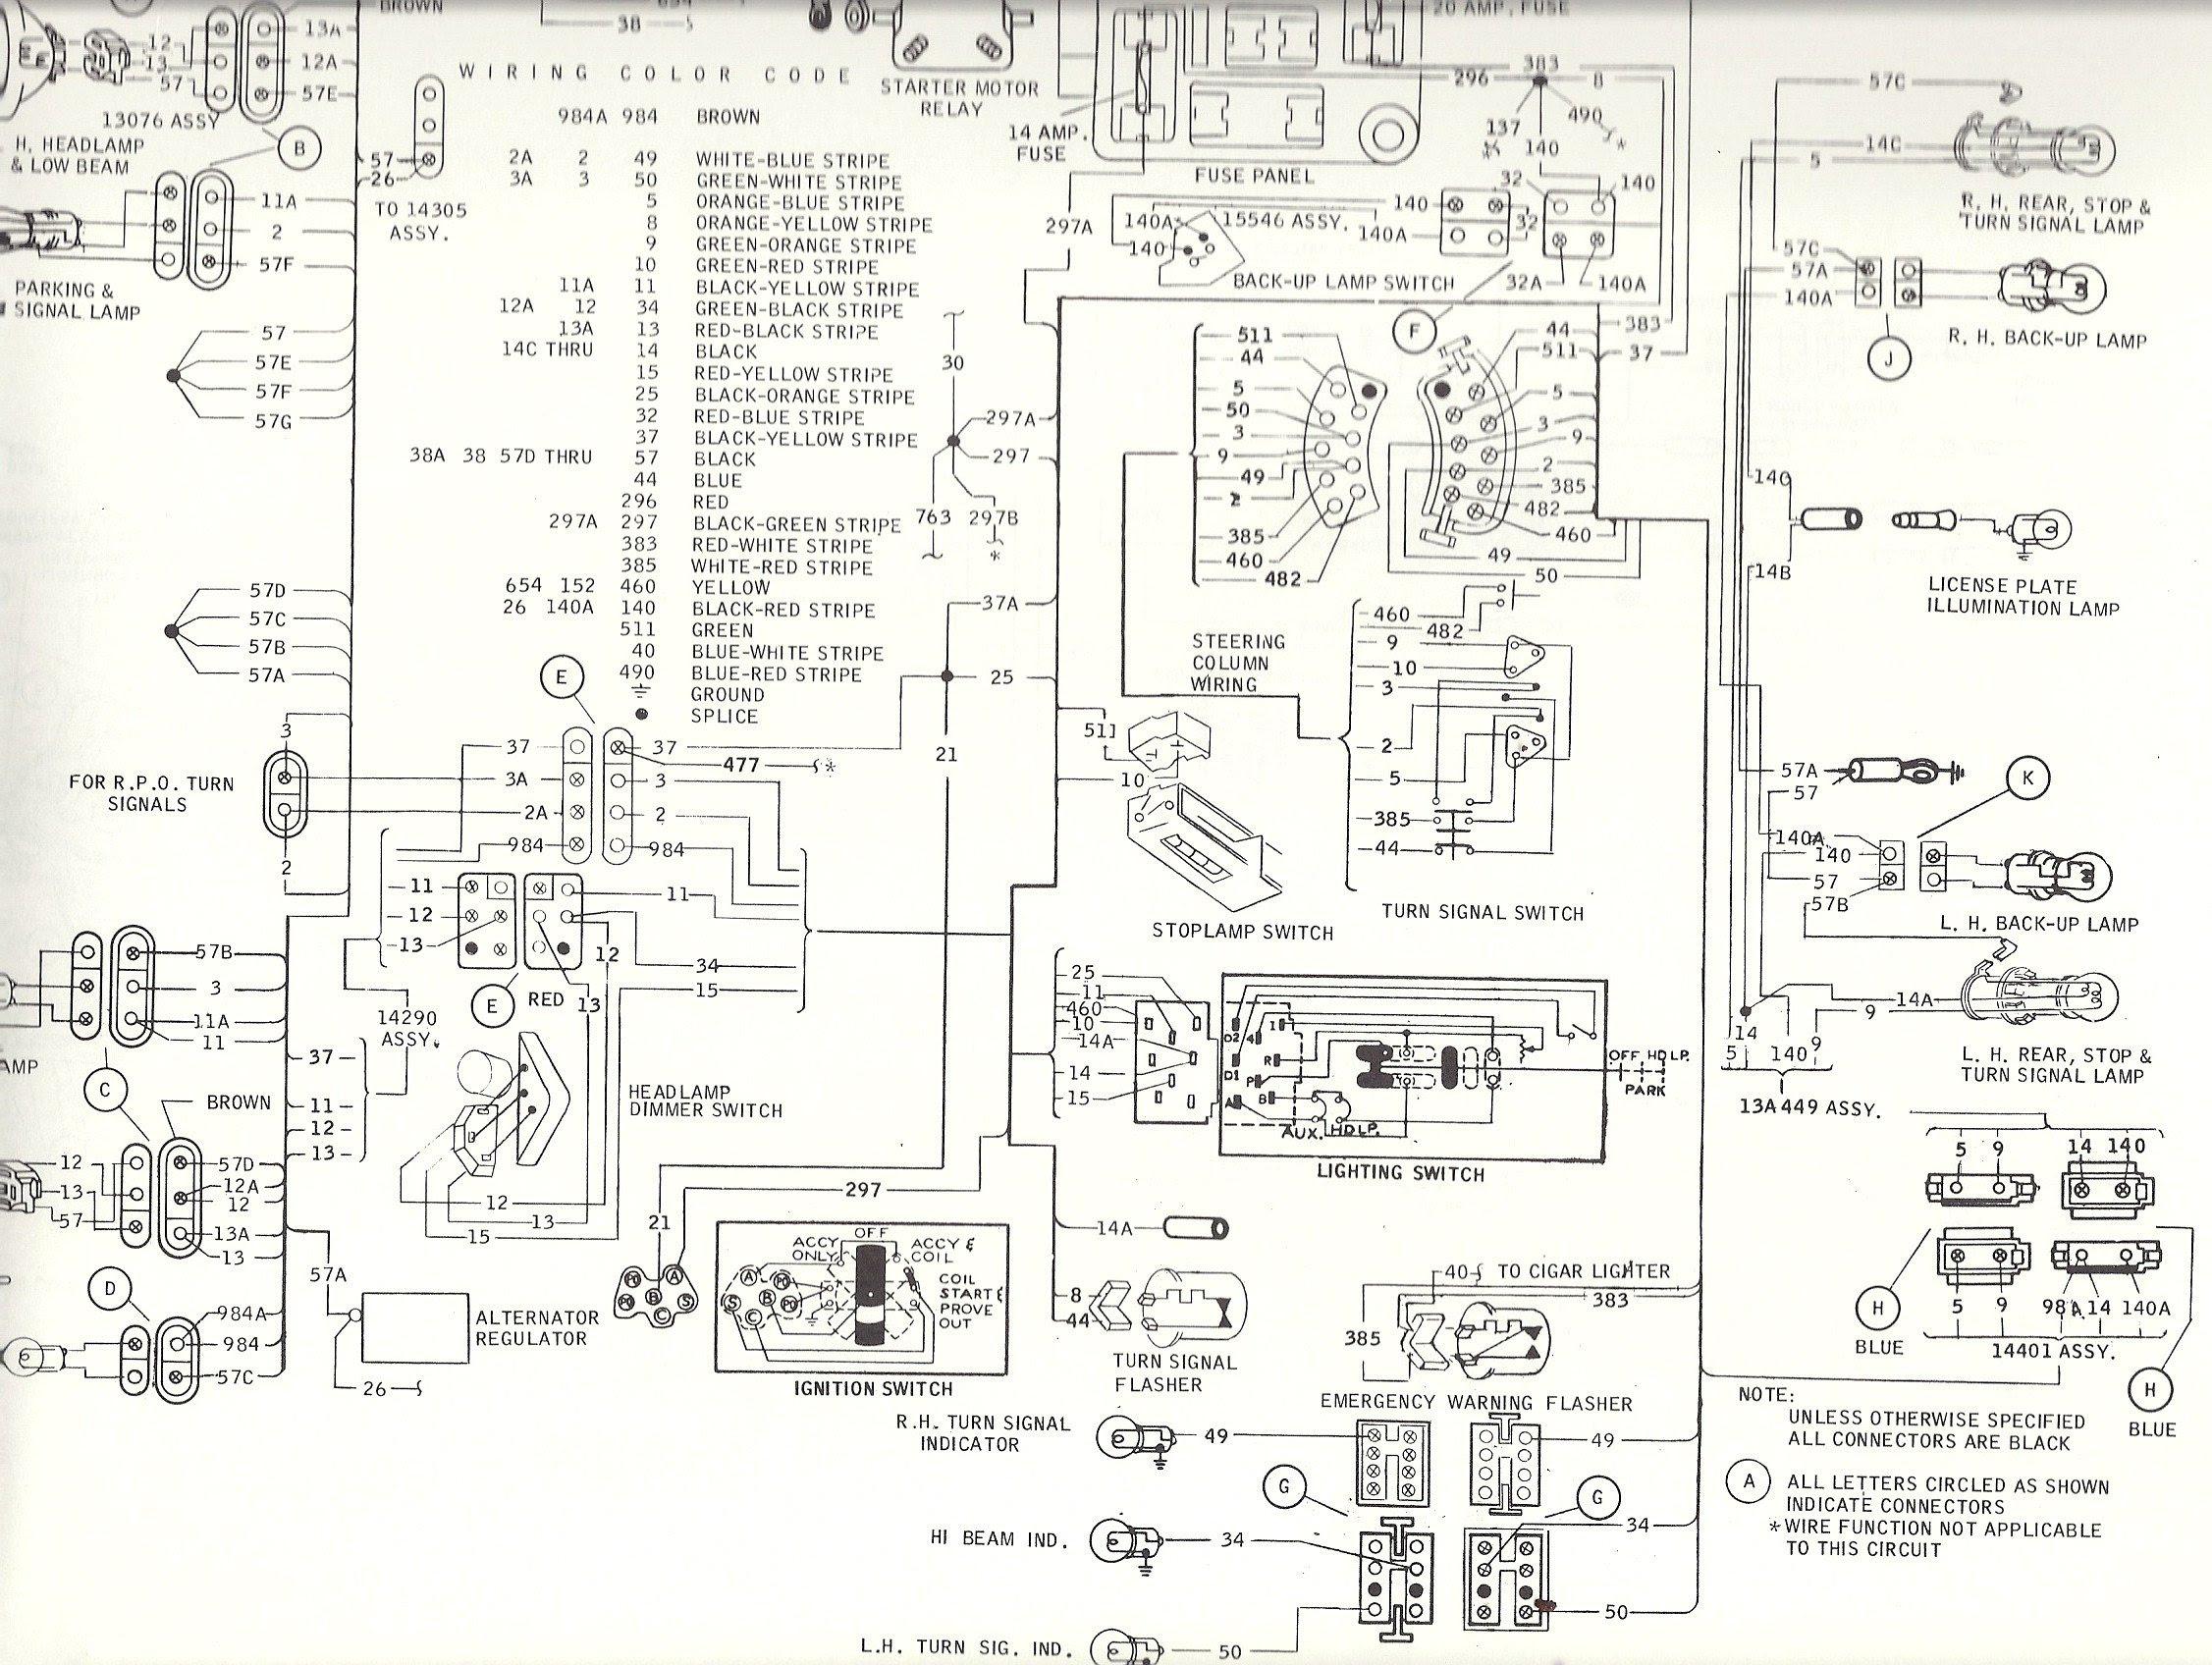 1970 Mustang Turn Signal Wiring Diagram Navistar Wiring Diagrams Begeboy Wiring Diagram Source